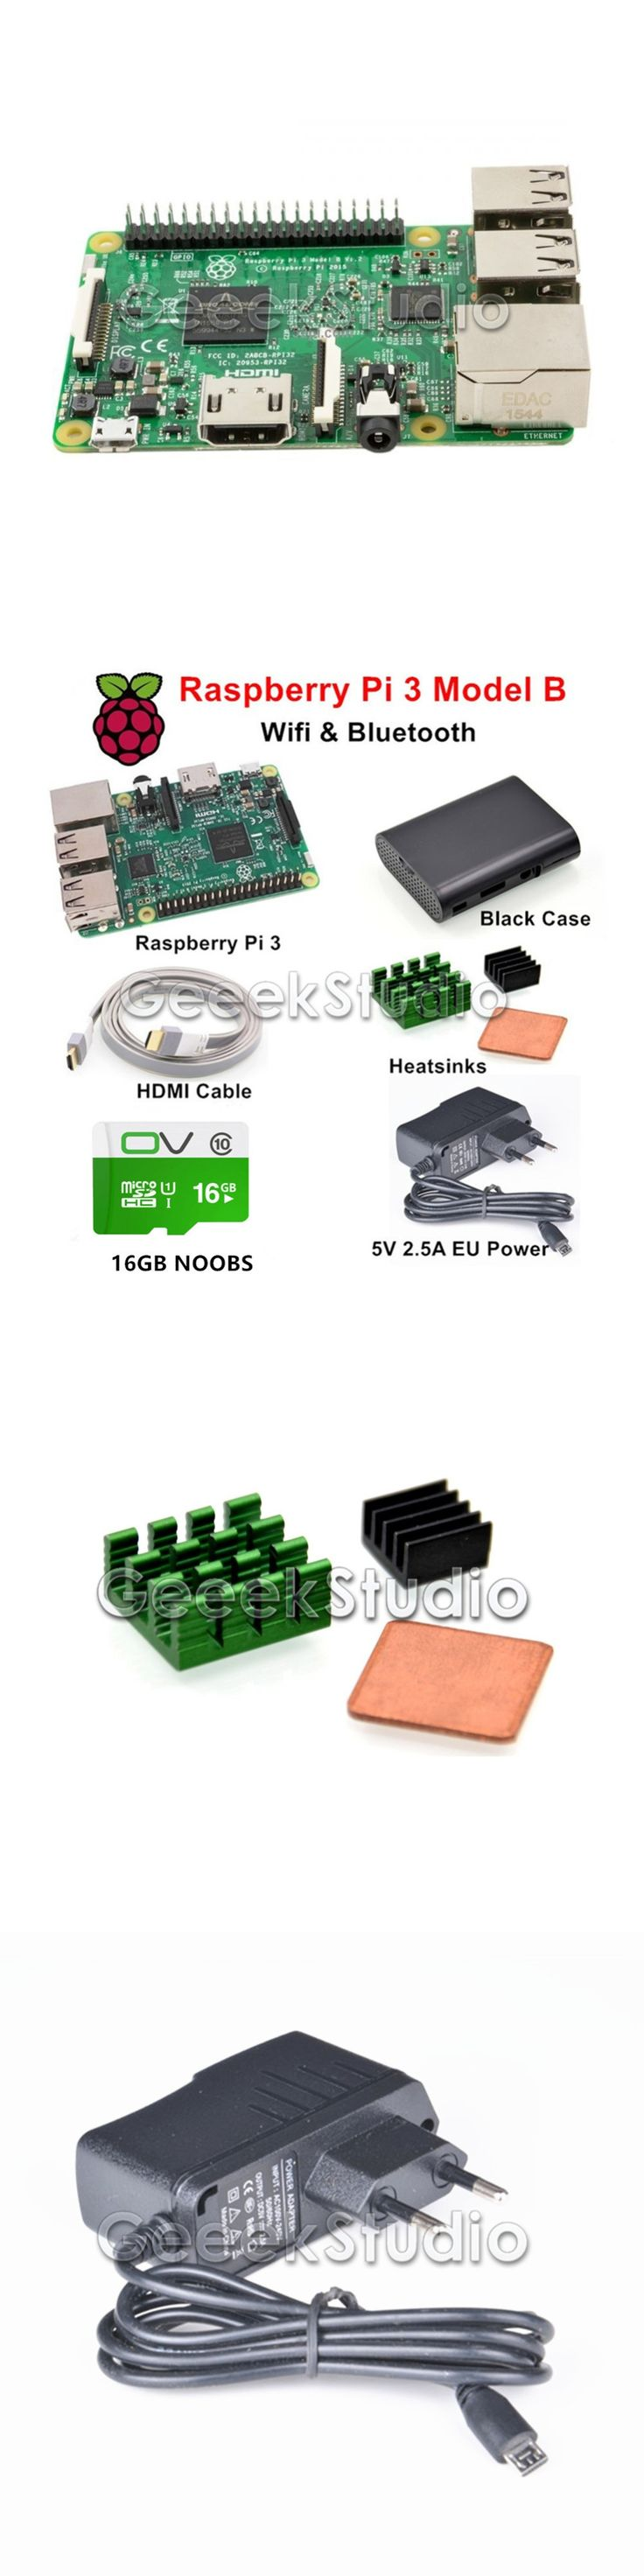 Raspberry Pi 3 Model B Starter Kit with 5V 2.5A EU/UK/US/AU Power Supply 16GB NOOBS ABS Black Case HDMI Cable Heatsinks